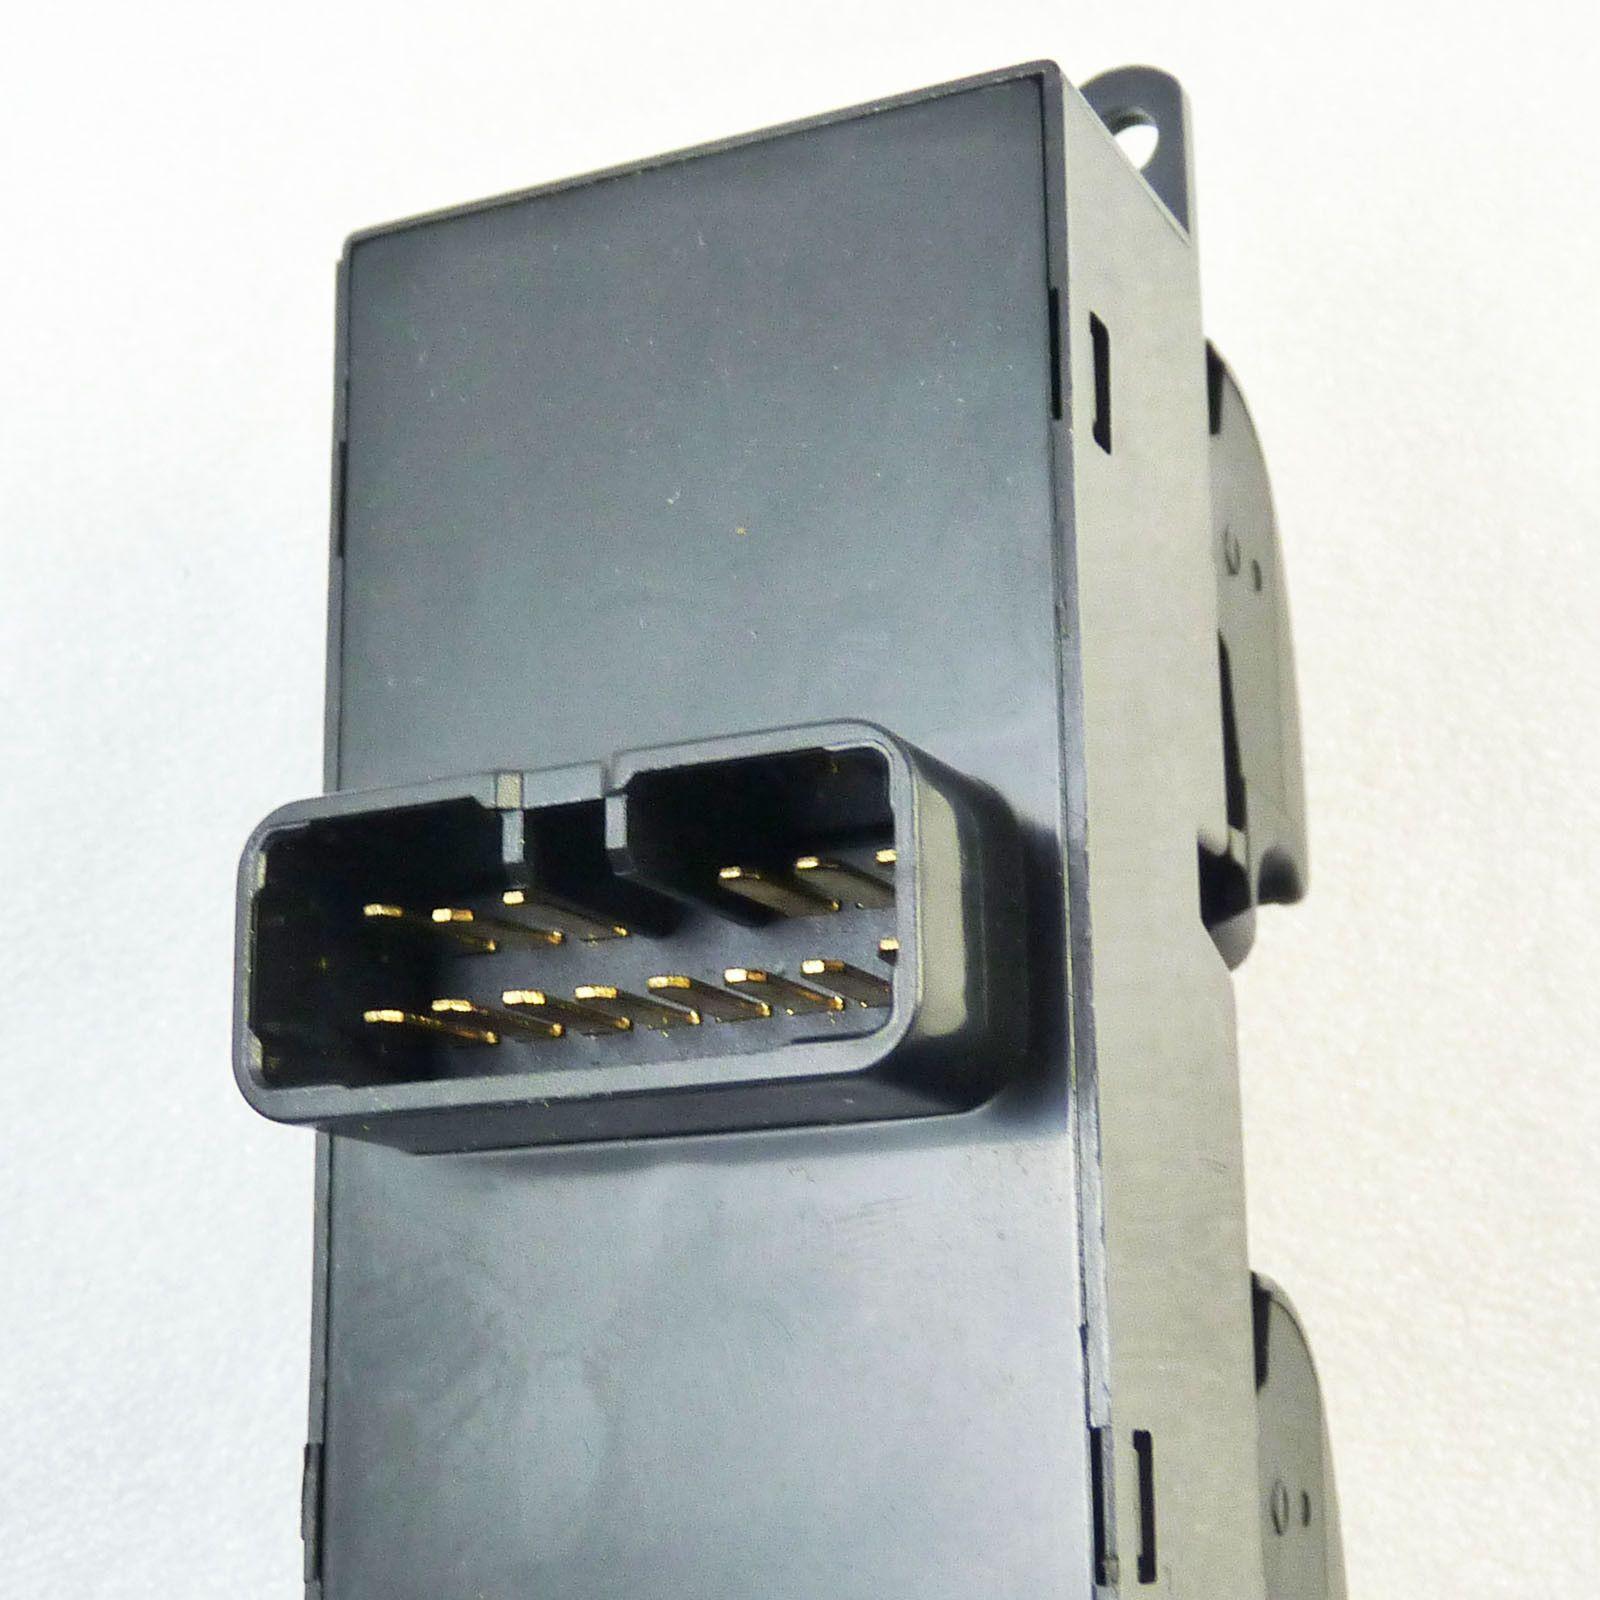 Botao Interruptor Vidro Eletrico Mitsubishi Outlander de 2007 a 2012 - 8608a185